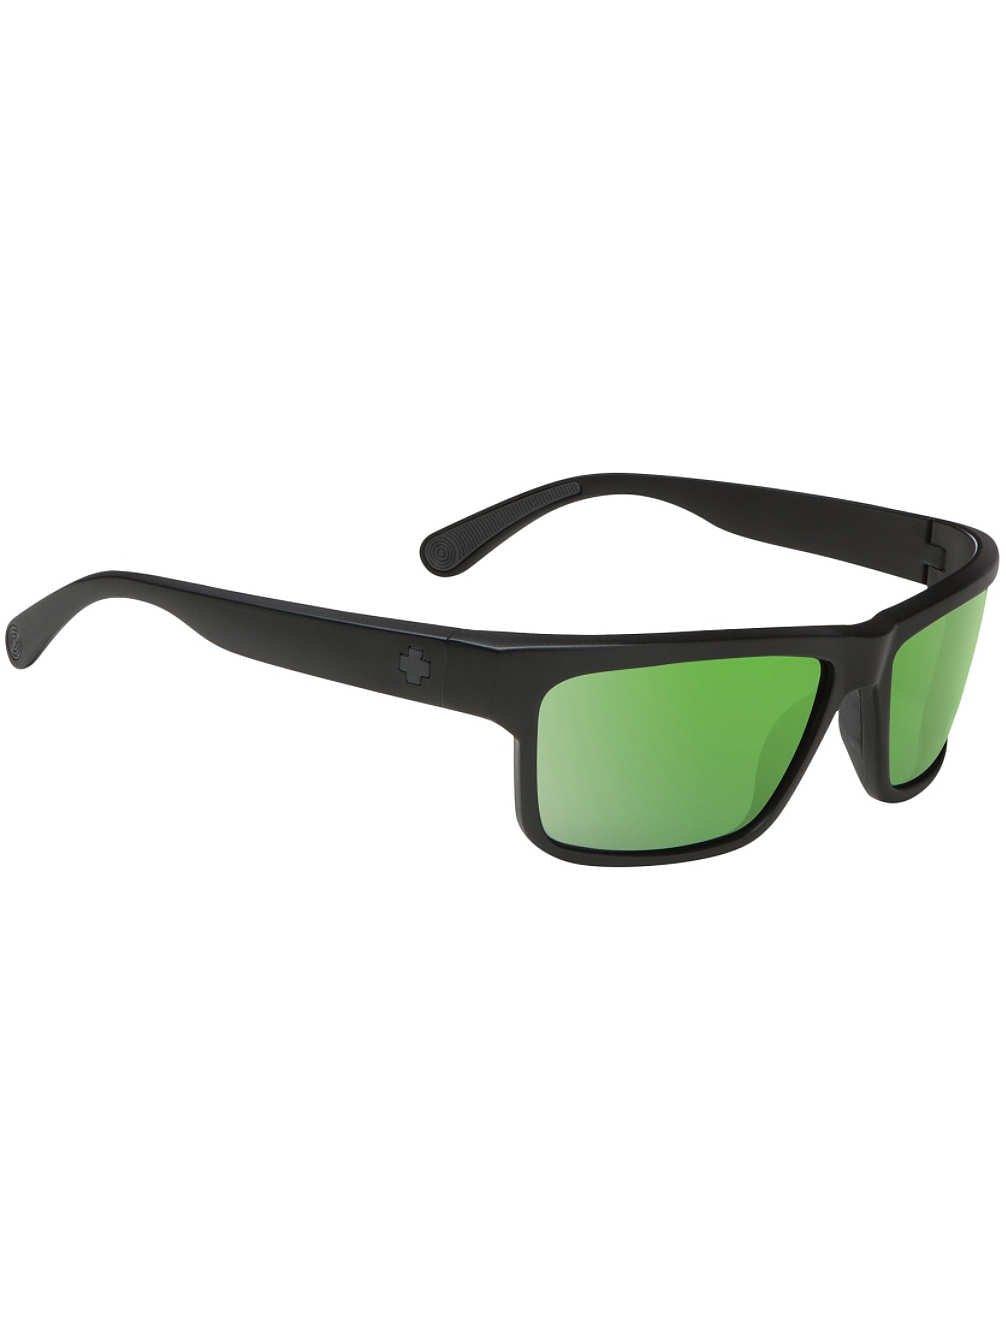 Spy Optic Frazier Polarized Wrap Sunglasses, 59 mm (Matte Black)